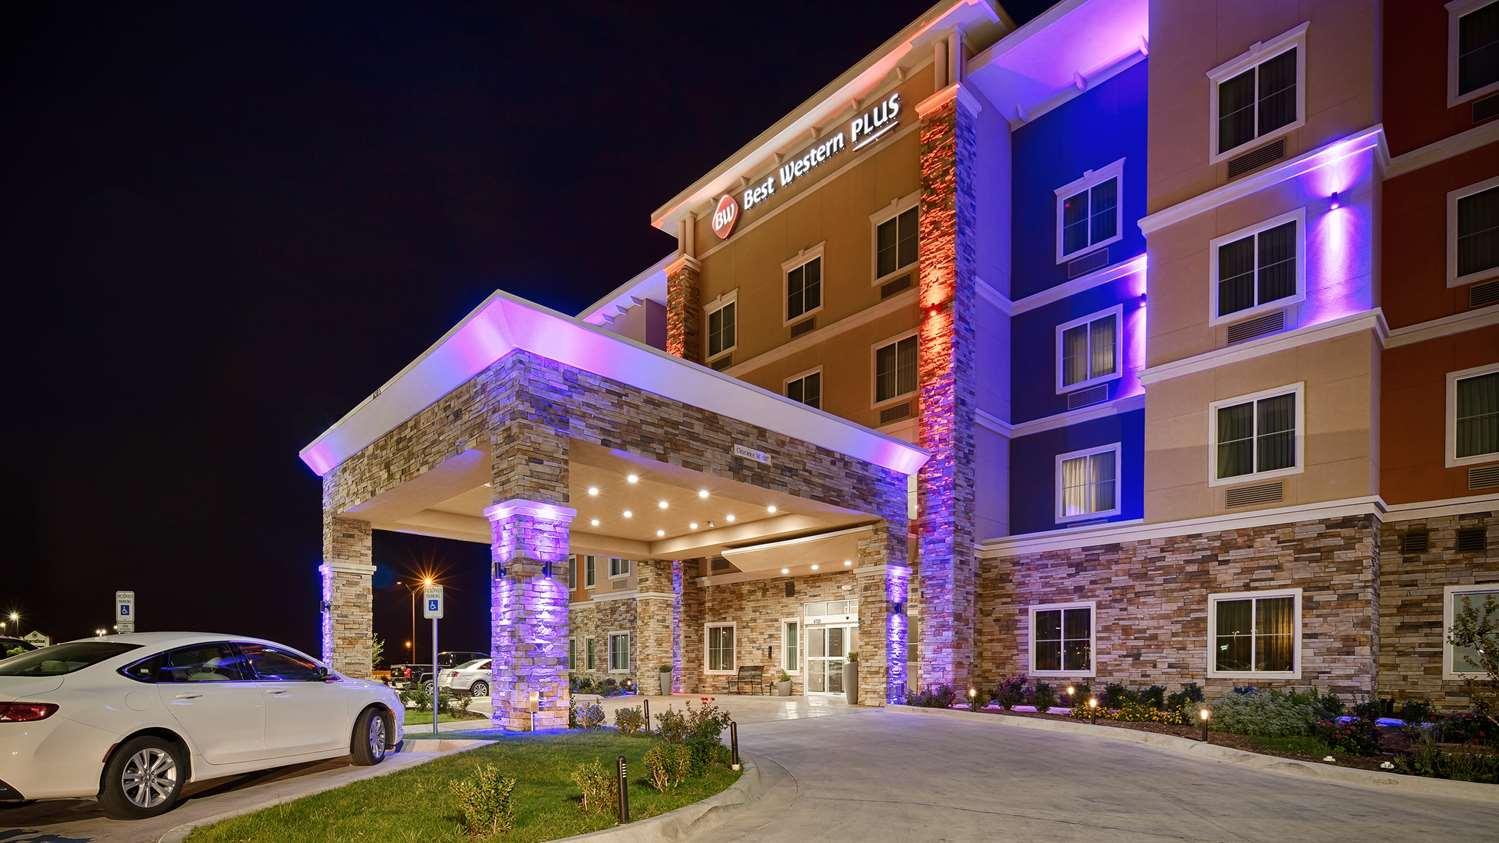 BEST WESTERN® PLUS TECH MEDICAL CENTER INN - Lubbock TX ...